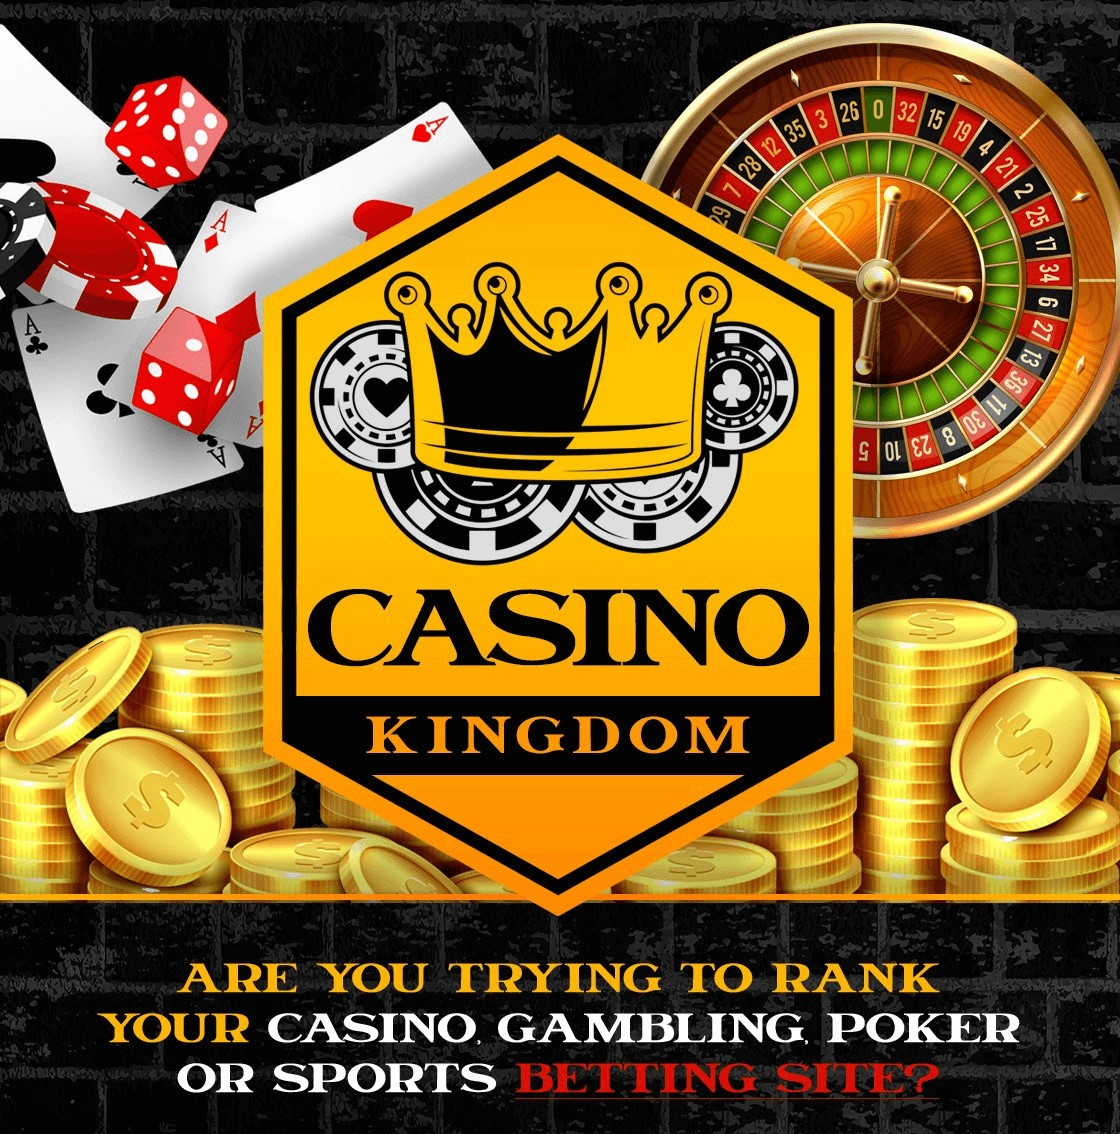 GET 300 POWERFUL PBN NETWORK NICHE RELEVENT ONLY Judi bola GAMBLING CASINO